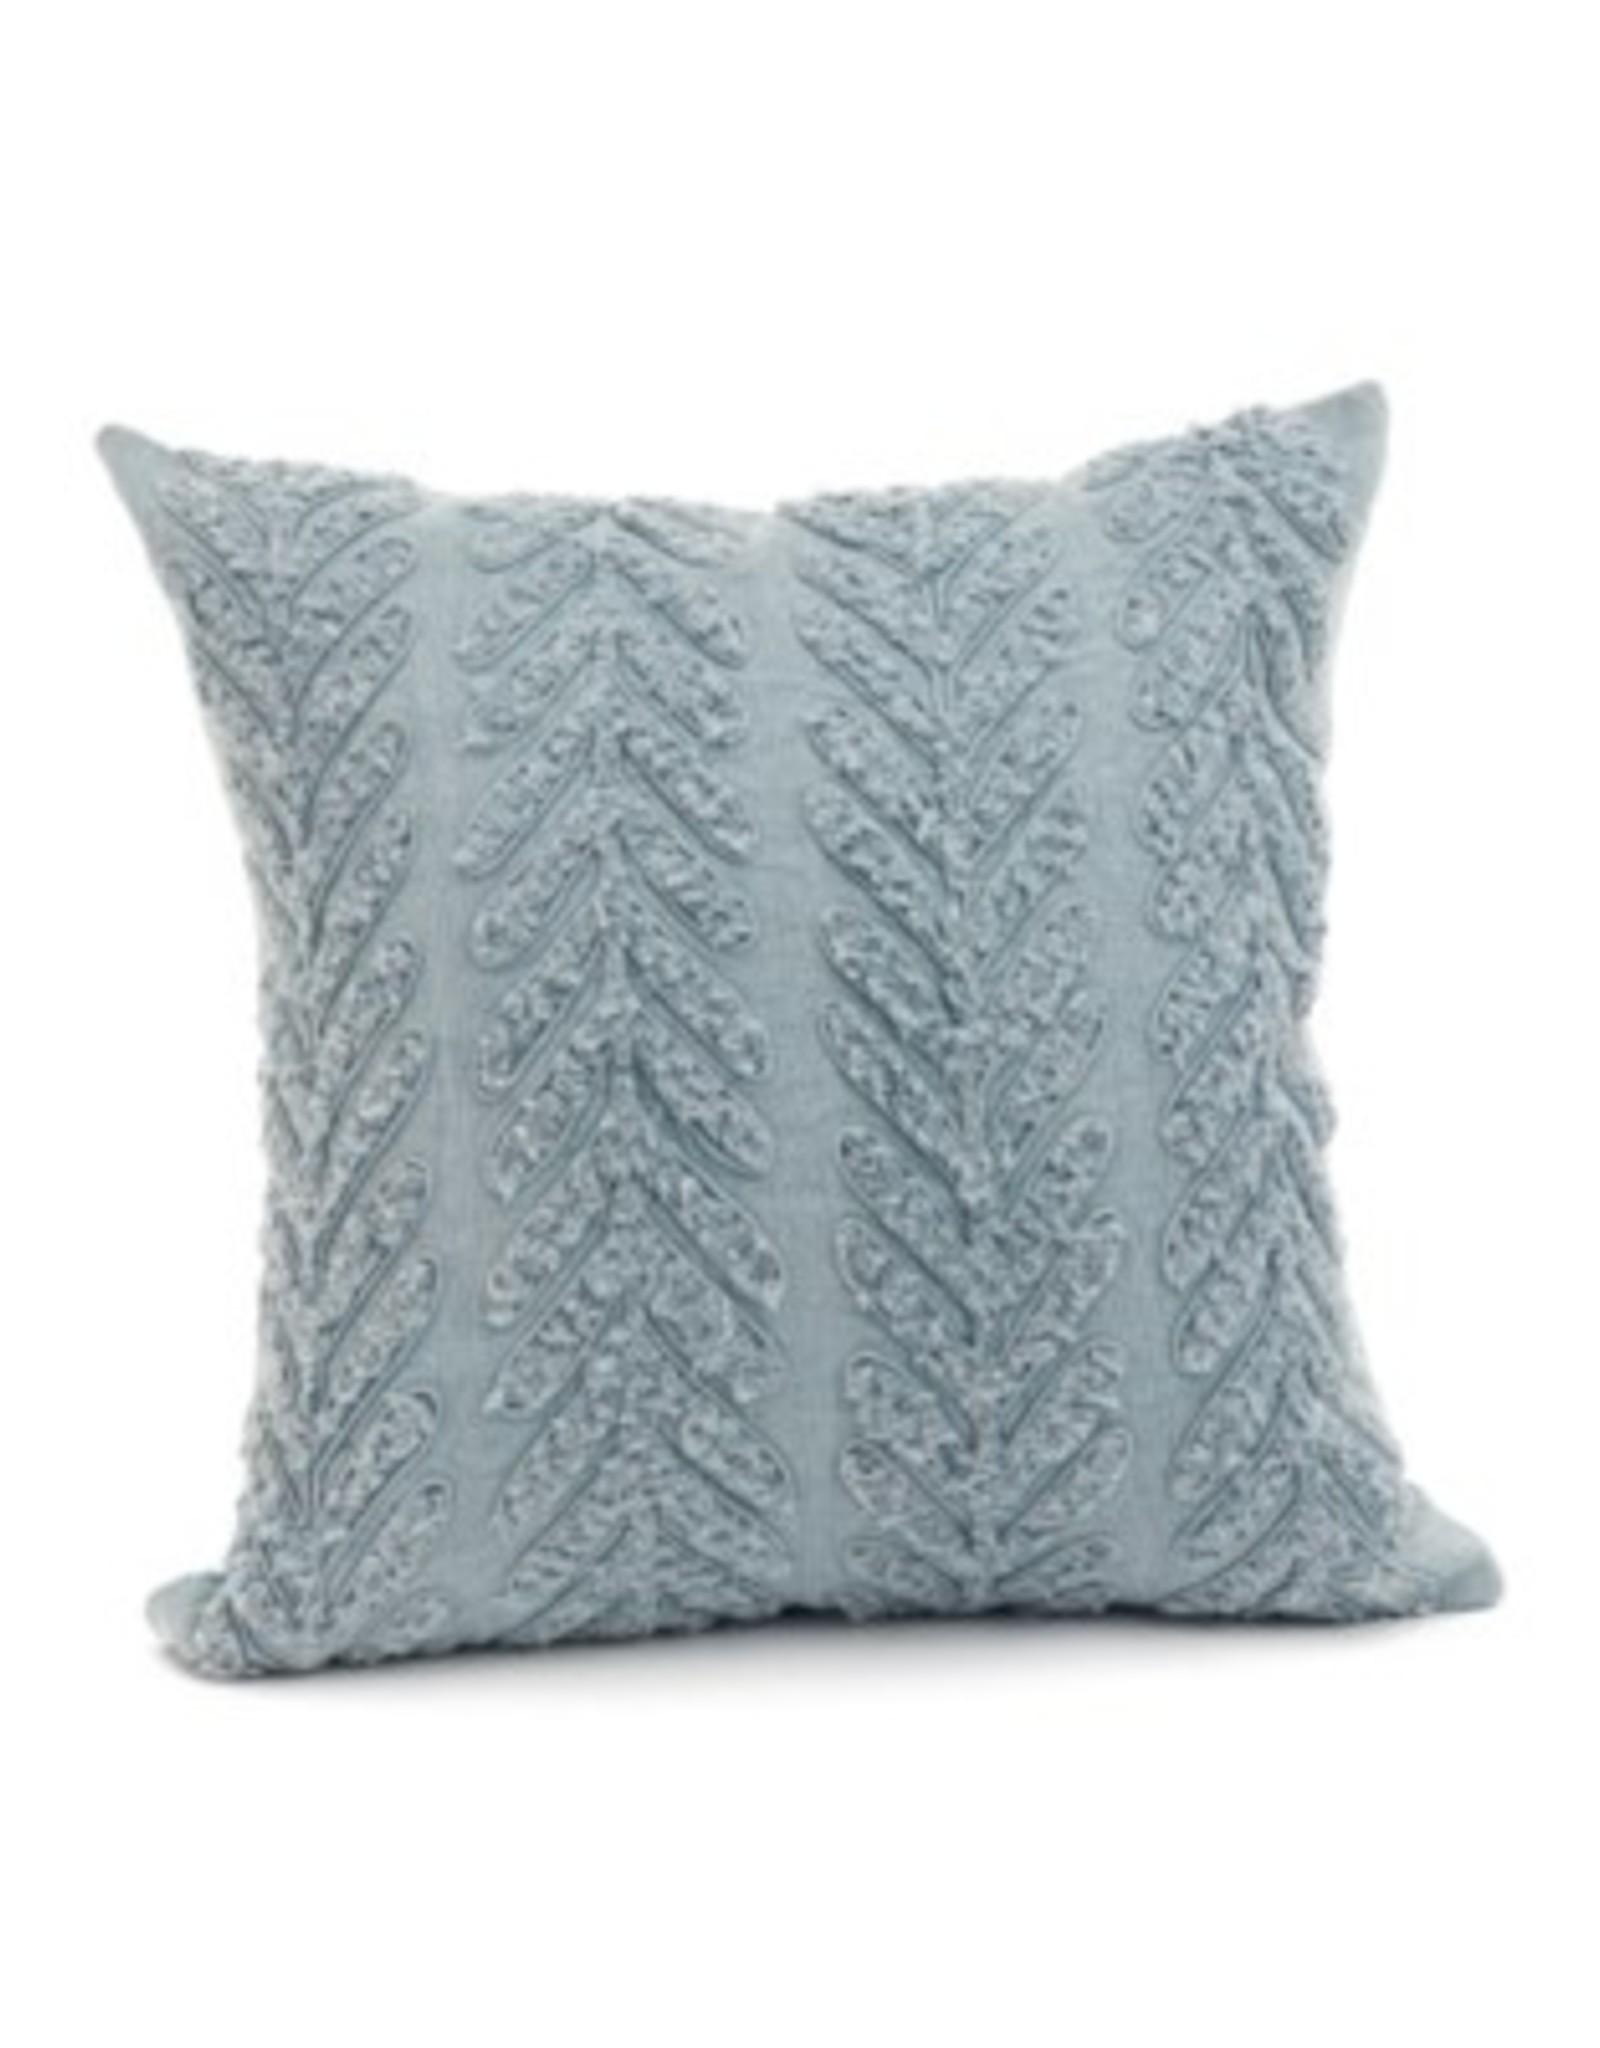 Cushions PC Acid Wash Light Blue 17 x 17 8190604